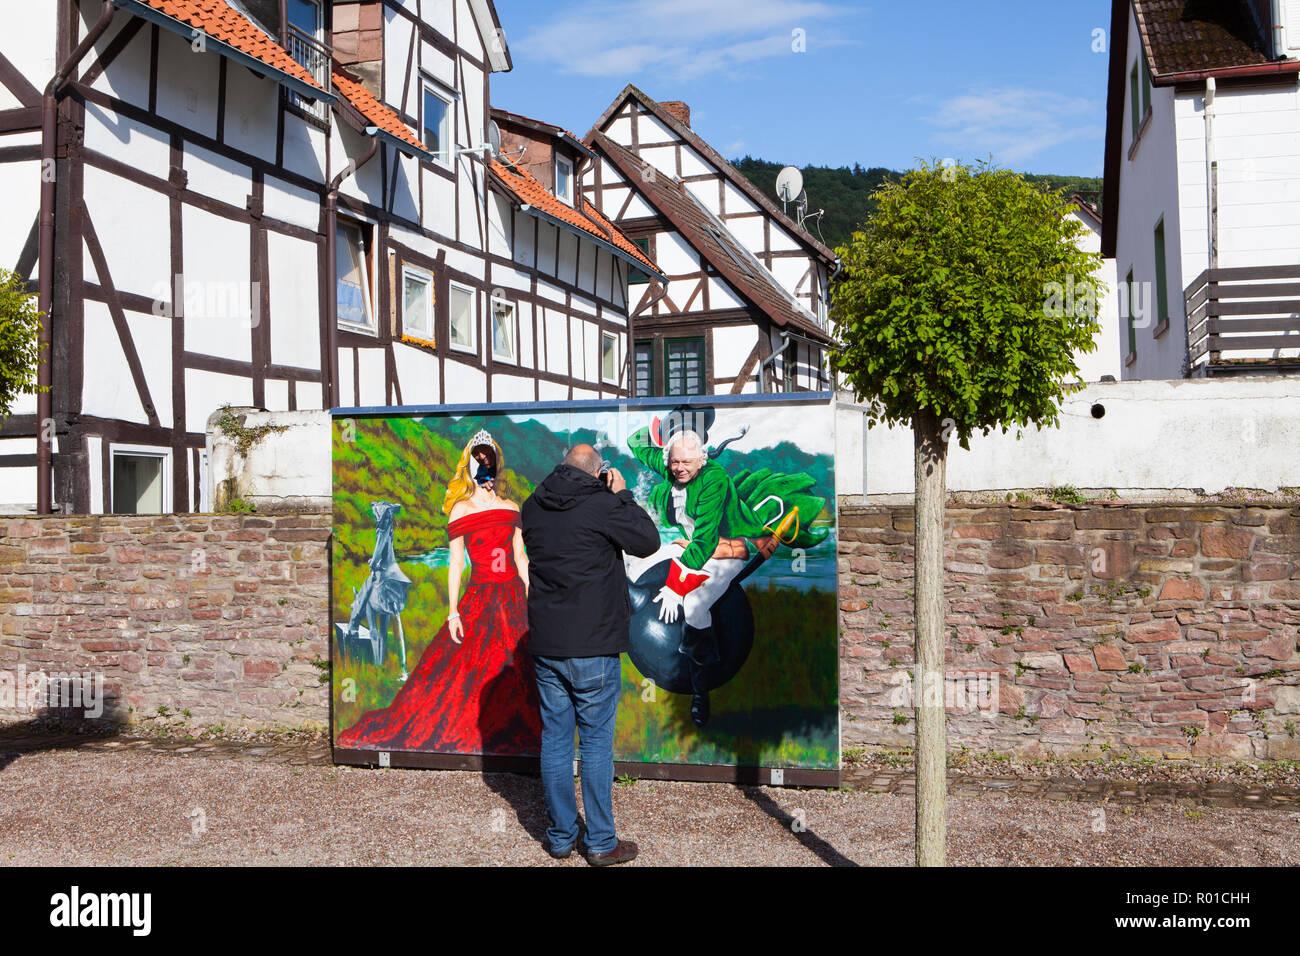 Ville de Bodenwerder, berceau du Baron Muenchhausen, Weserbergland, Basse-Saxe, Allemagne, Europe Banque D'Images